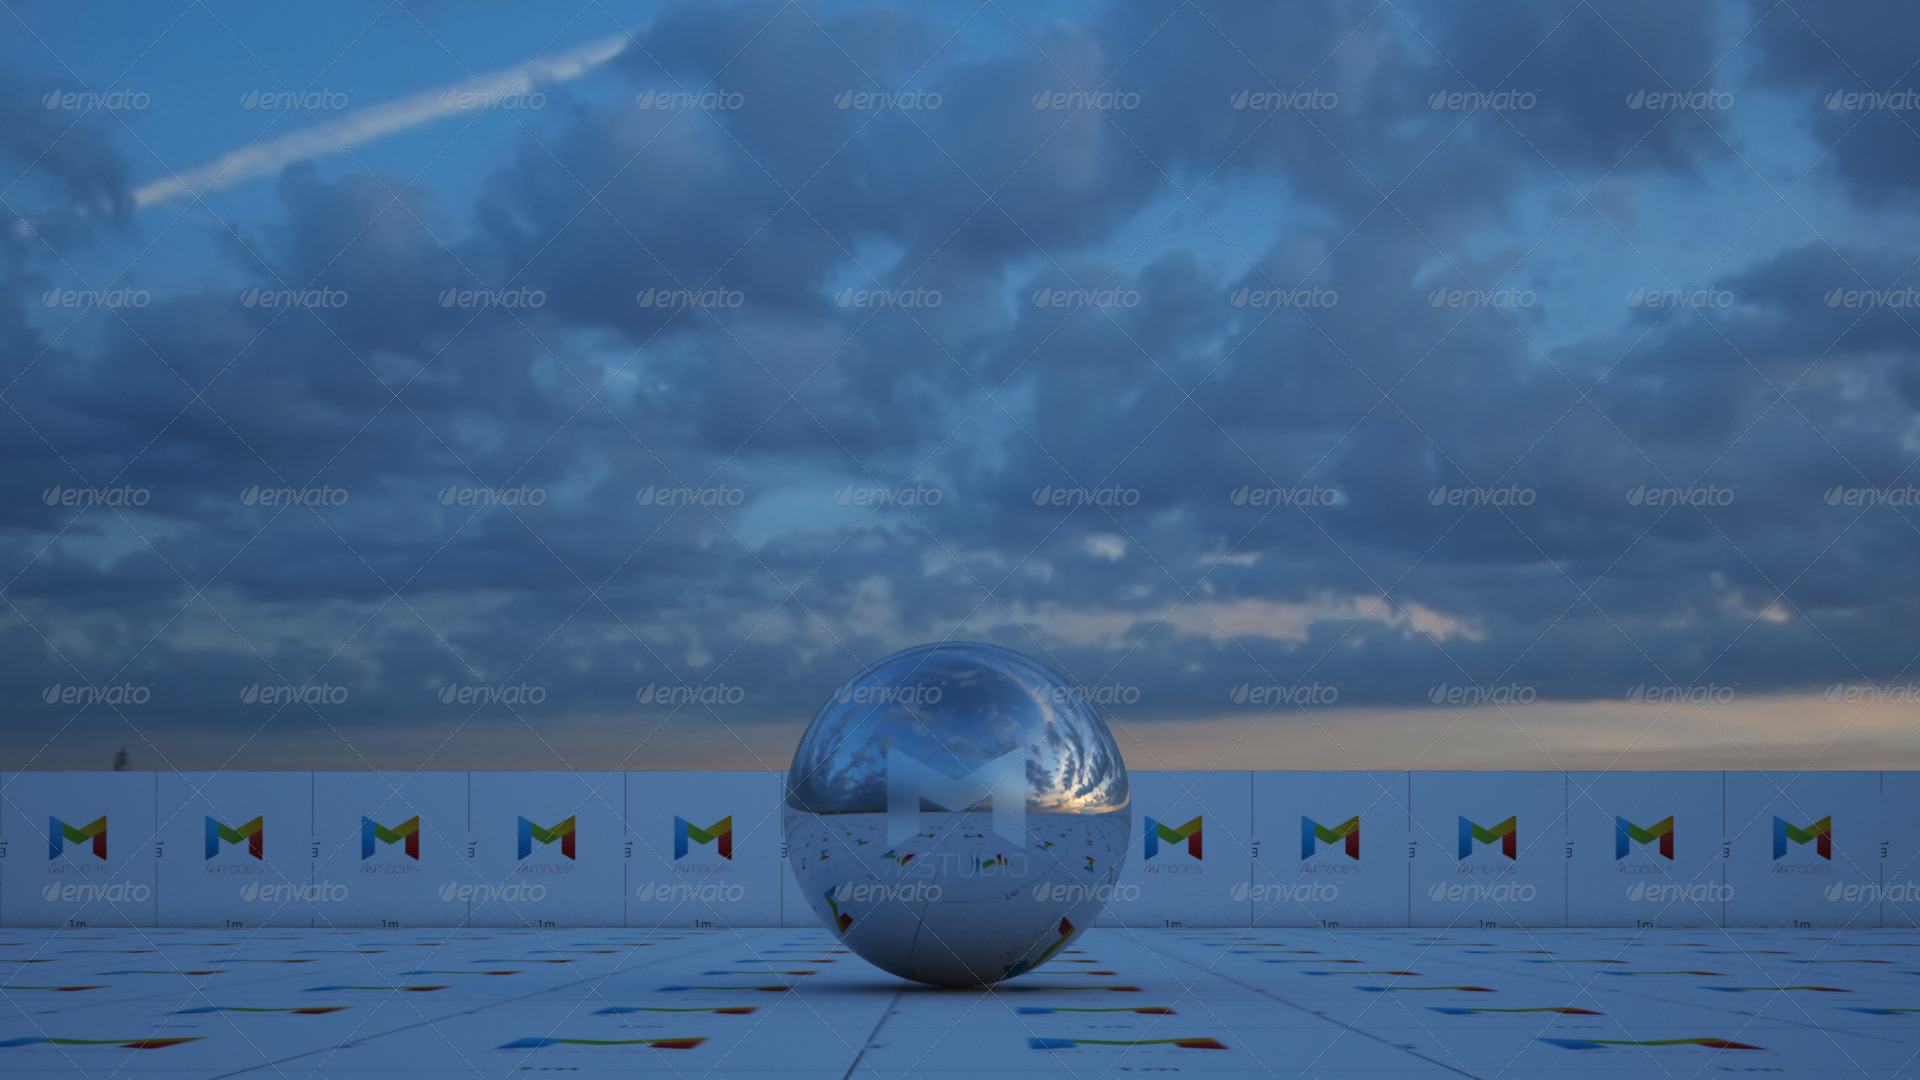 Spherical hdri cloudy sunrise full sky by cginstitute 3docean preview01g altavistaventures Gallery